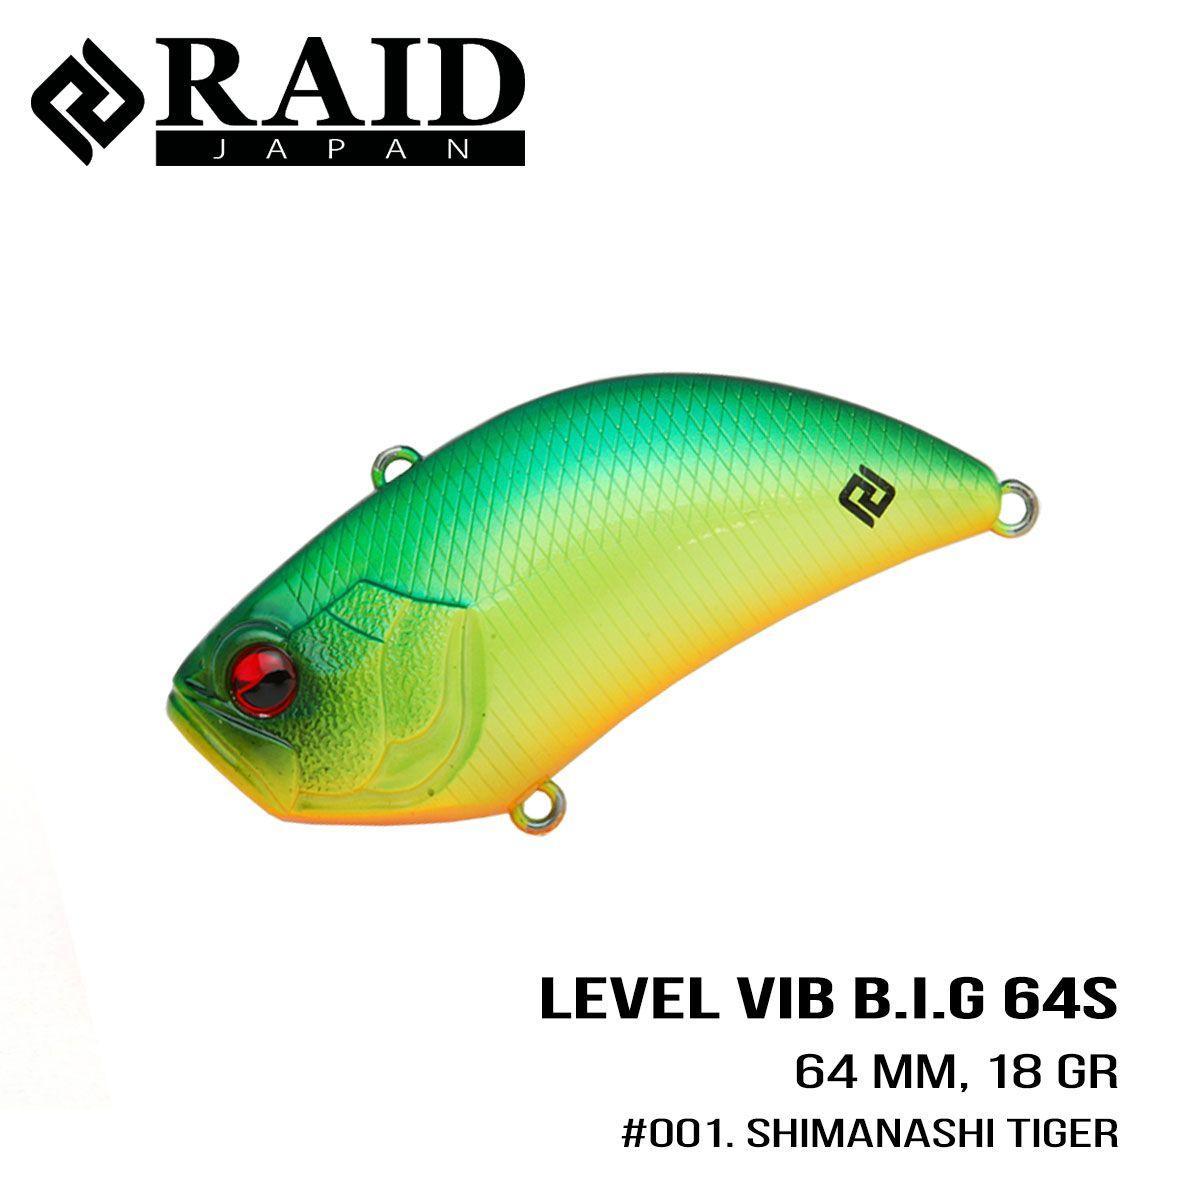 Воблер Raid Level Vib B.I.G. (64mm, 18g) (001 Shimanashi Tiger)